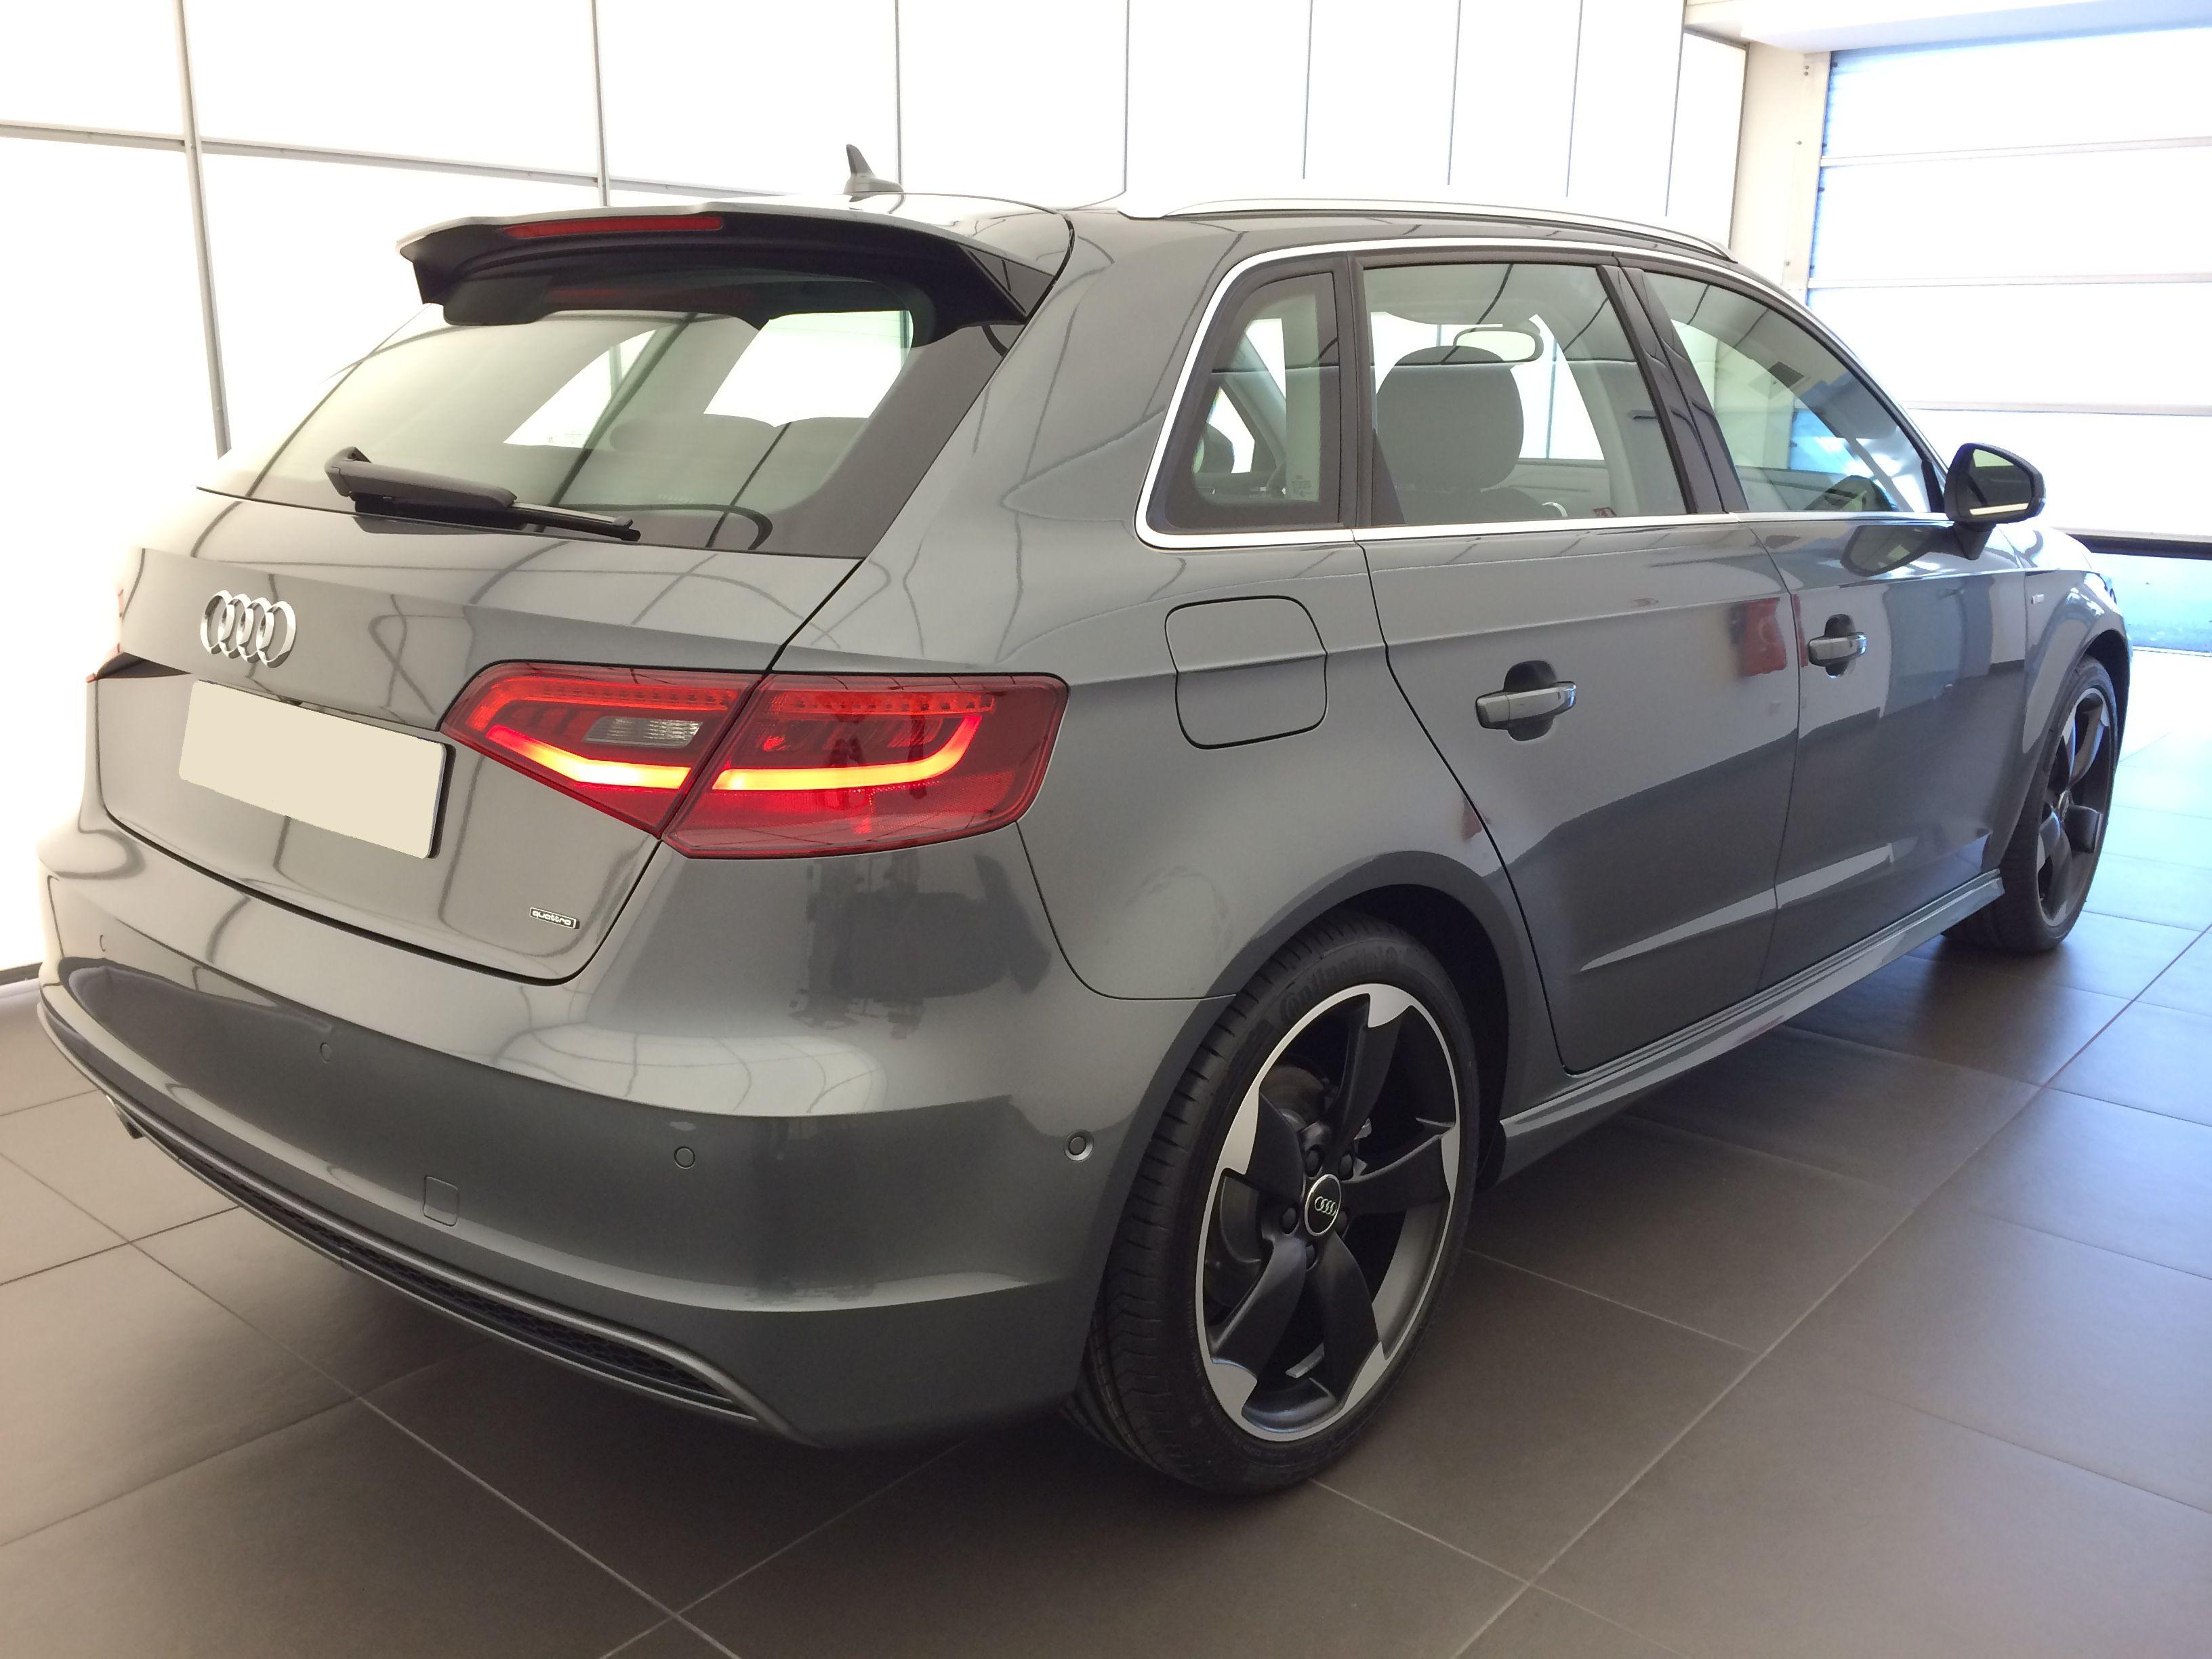 Kelebihan Audi A3 Ambition Murah Berkualitas